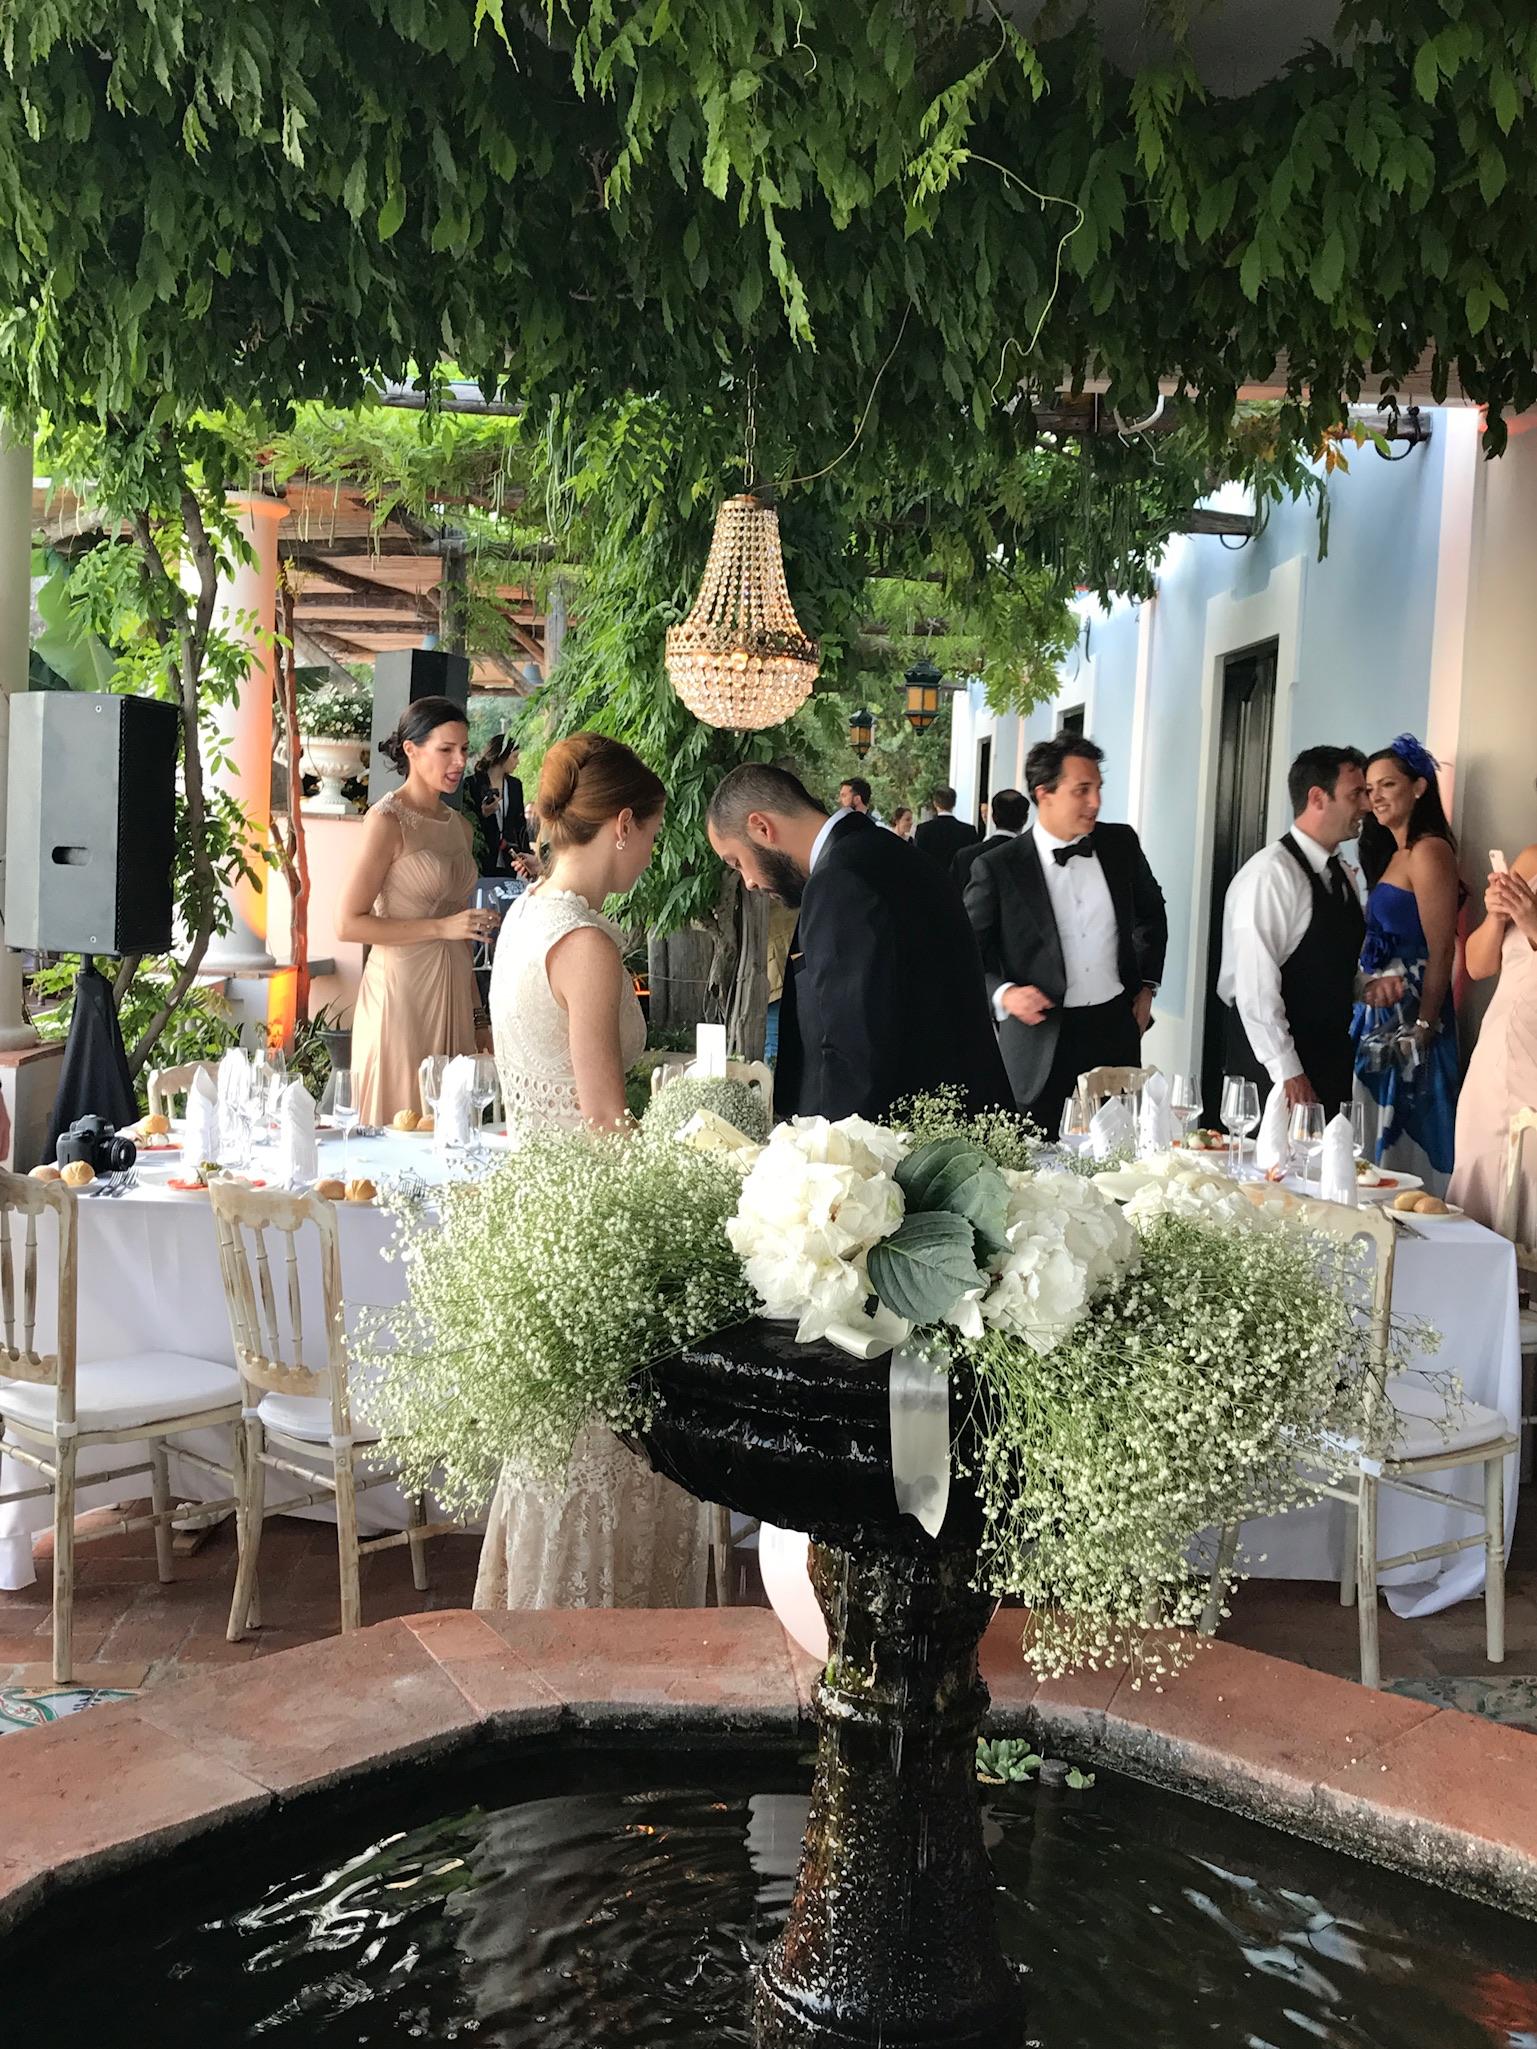 https://www.weddingamalfi.com/wp-content/uploads/Nathalie-and-Benjamin-Wedding-in-Positano-Italy-31.jpg